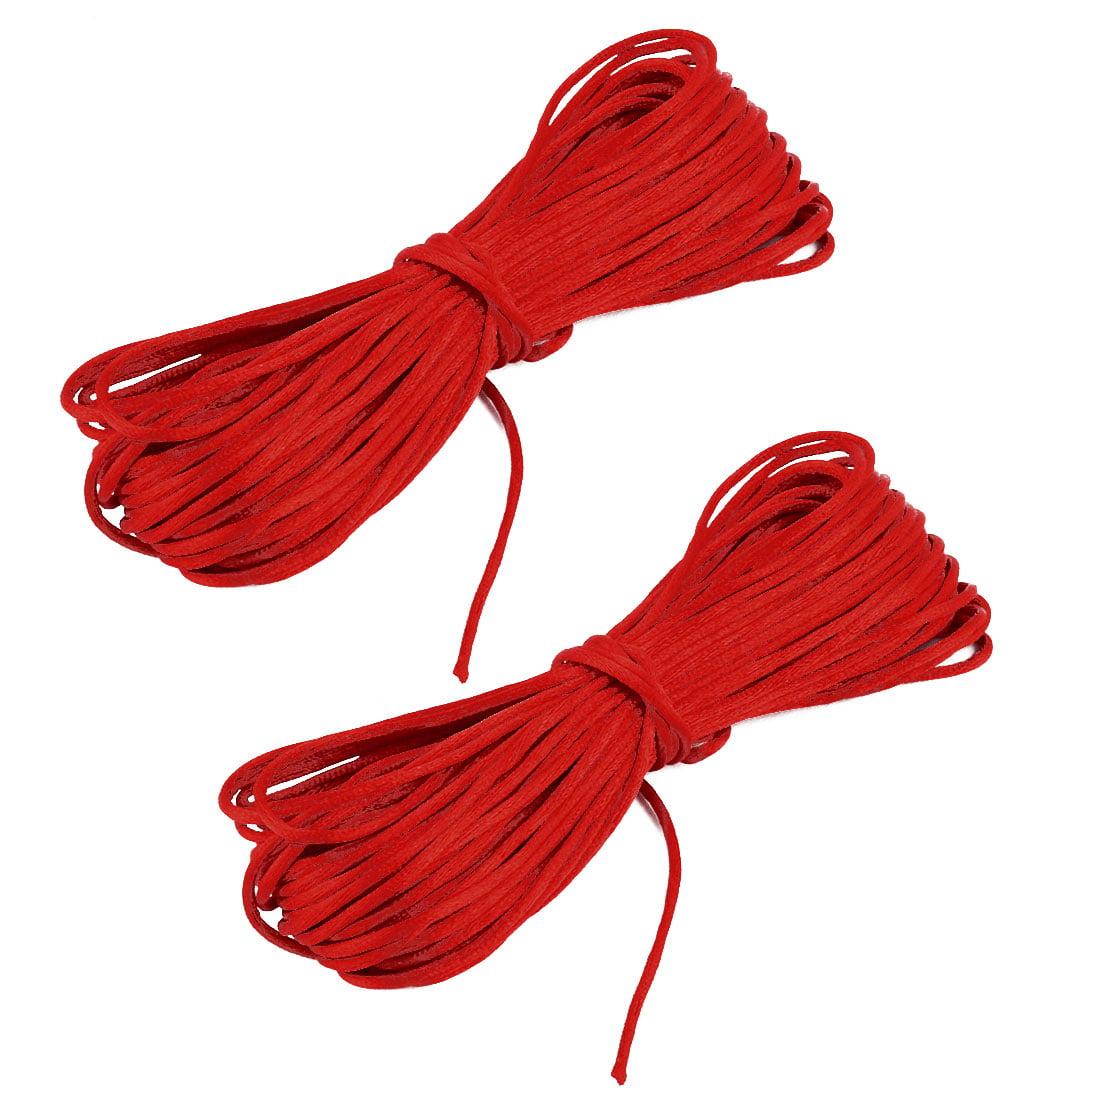 Festival Nylon DIY Handcraft Bracelet Chain Cord String Rope Red 22 Yards 2pcs